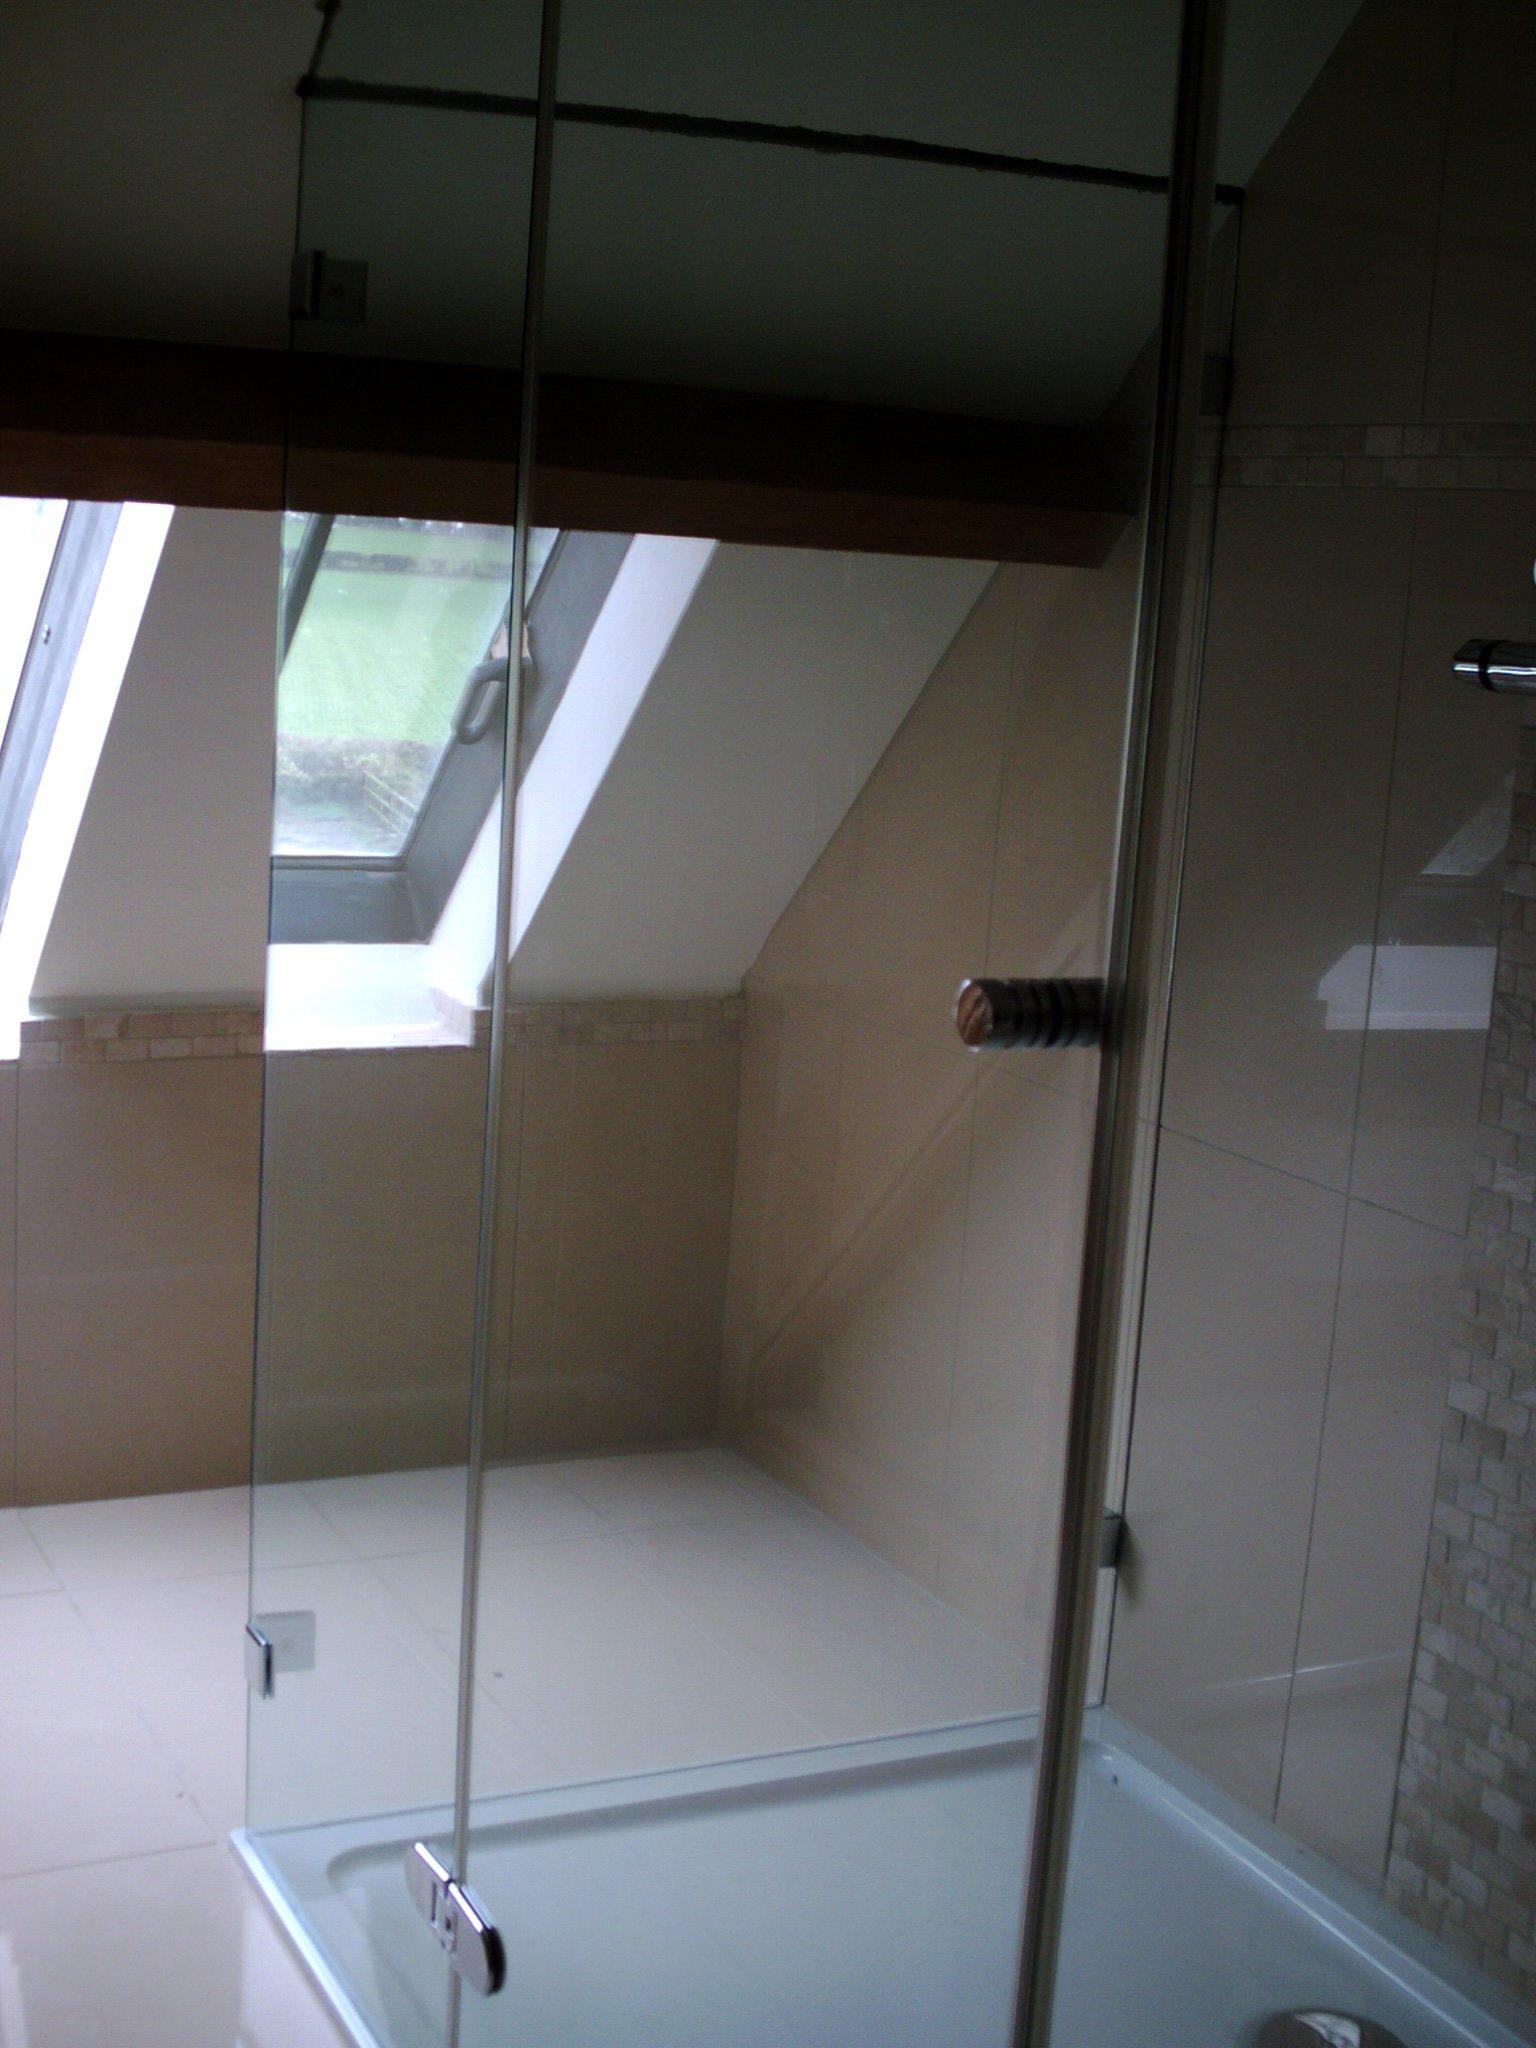 Bespoke glass installations